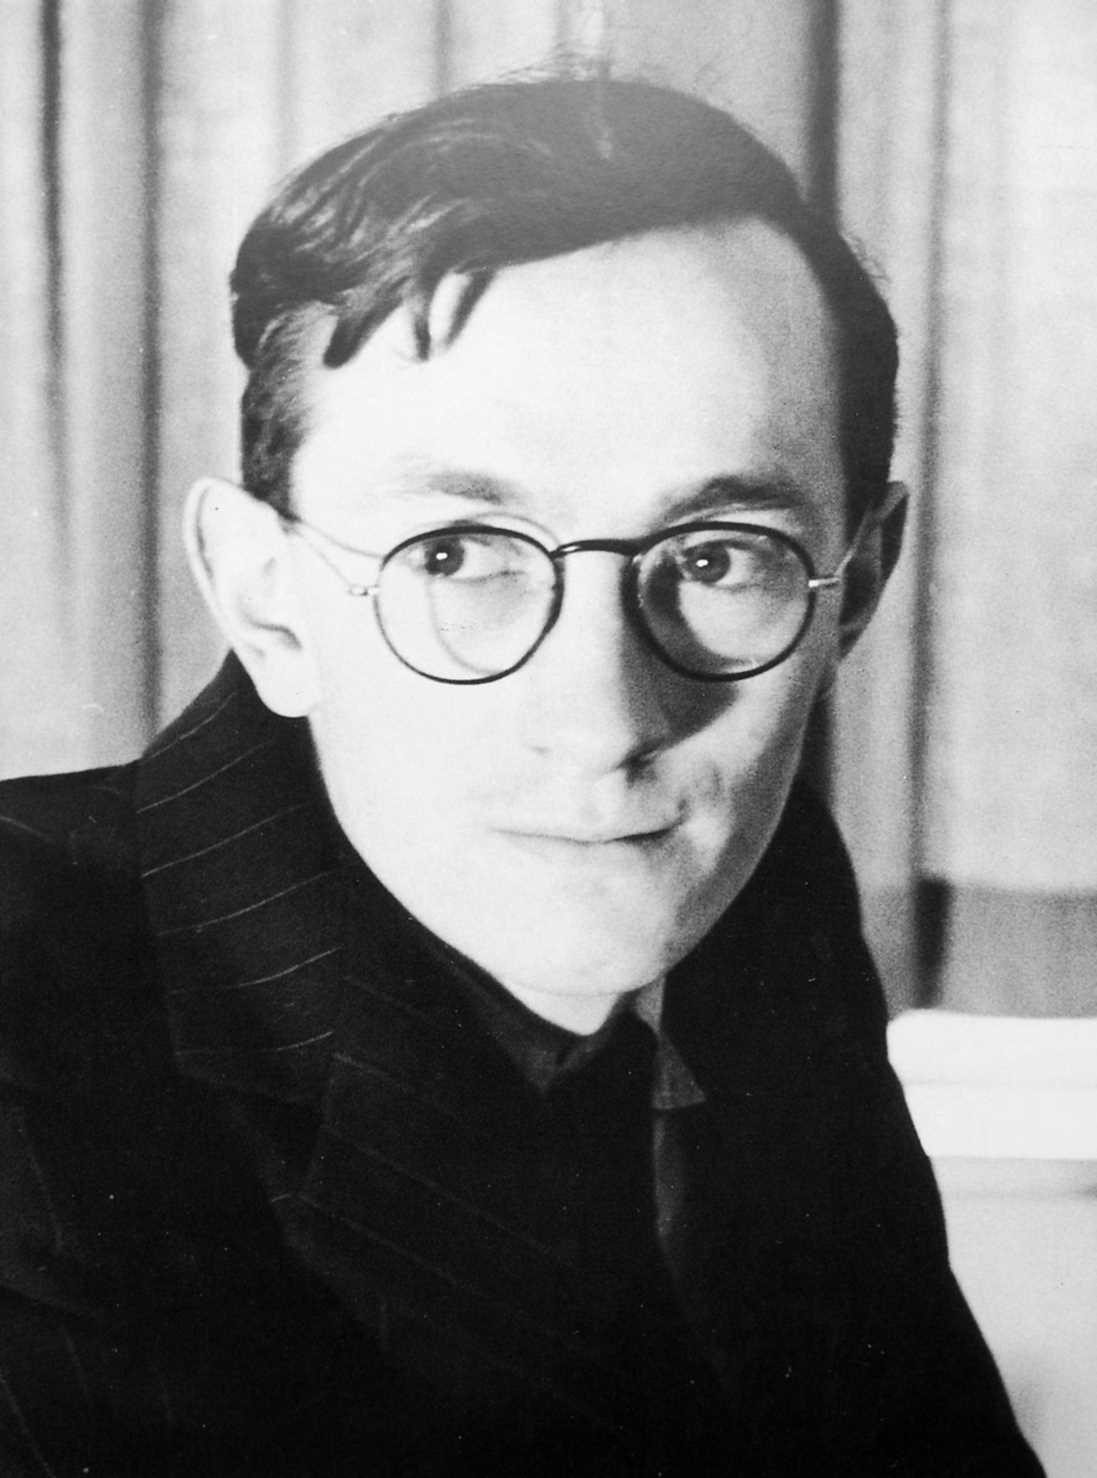 Alex Comfort fotografiat per Vernon Richards en 1946